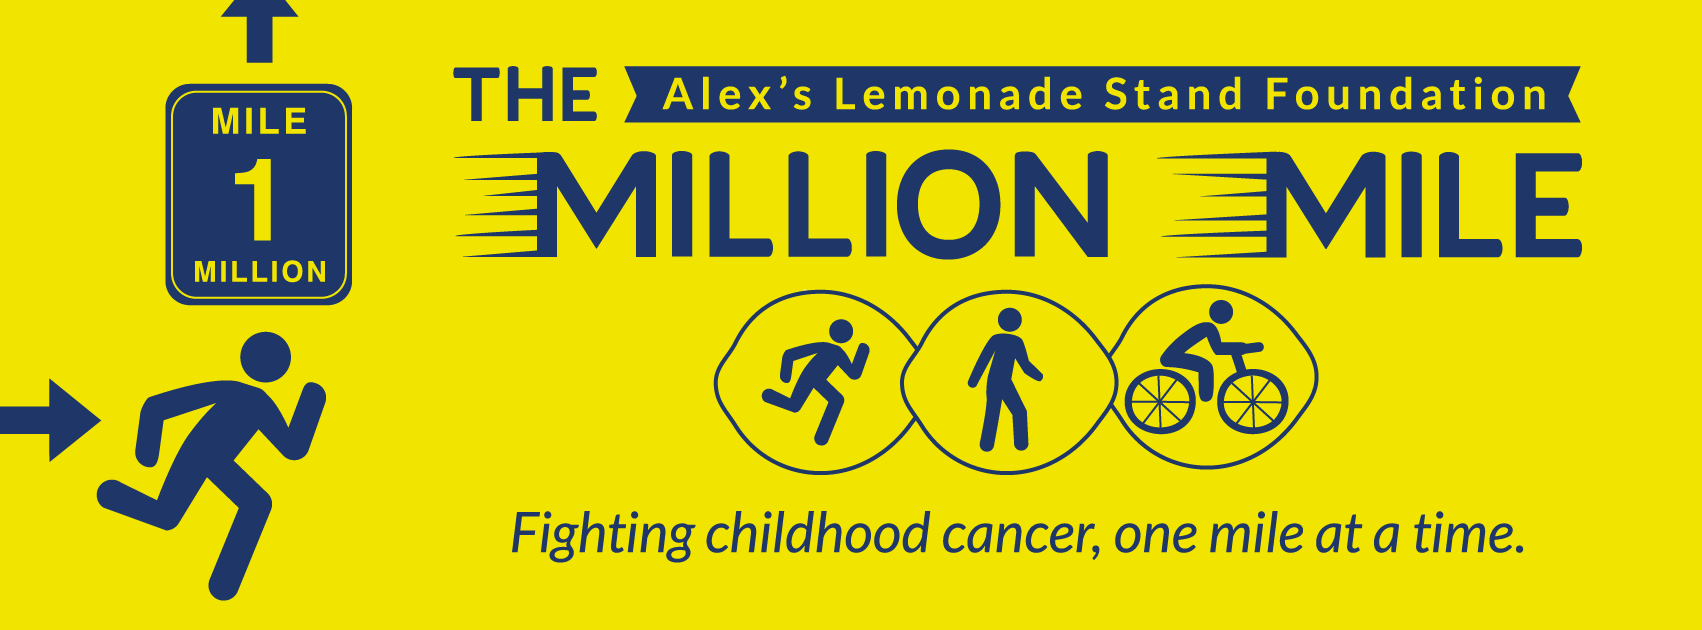 downloads alex s lemonade stand foundation for childhood cancer